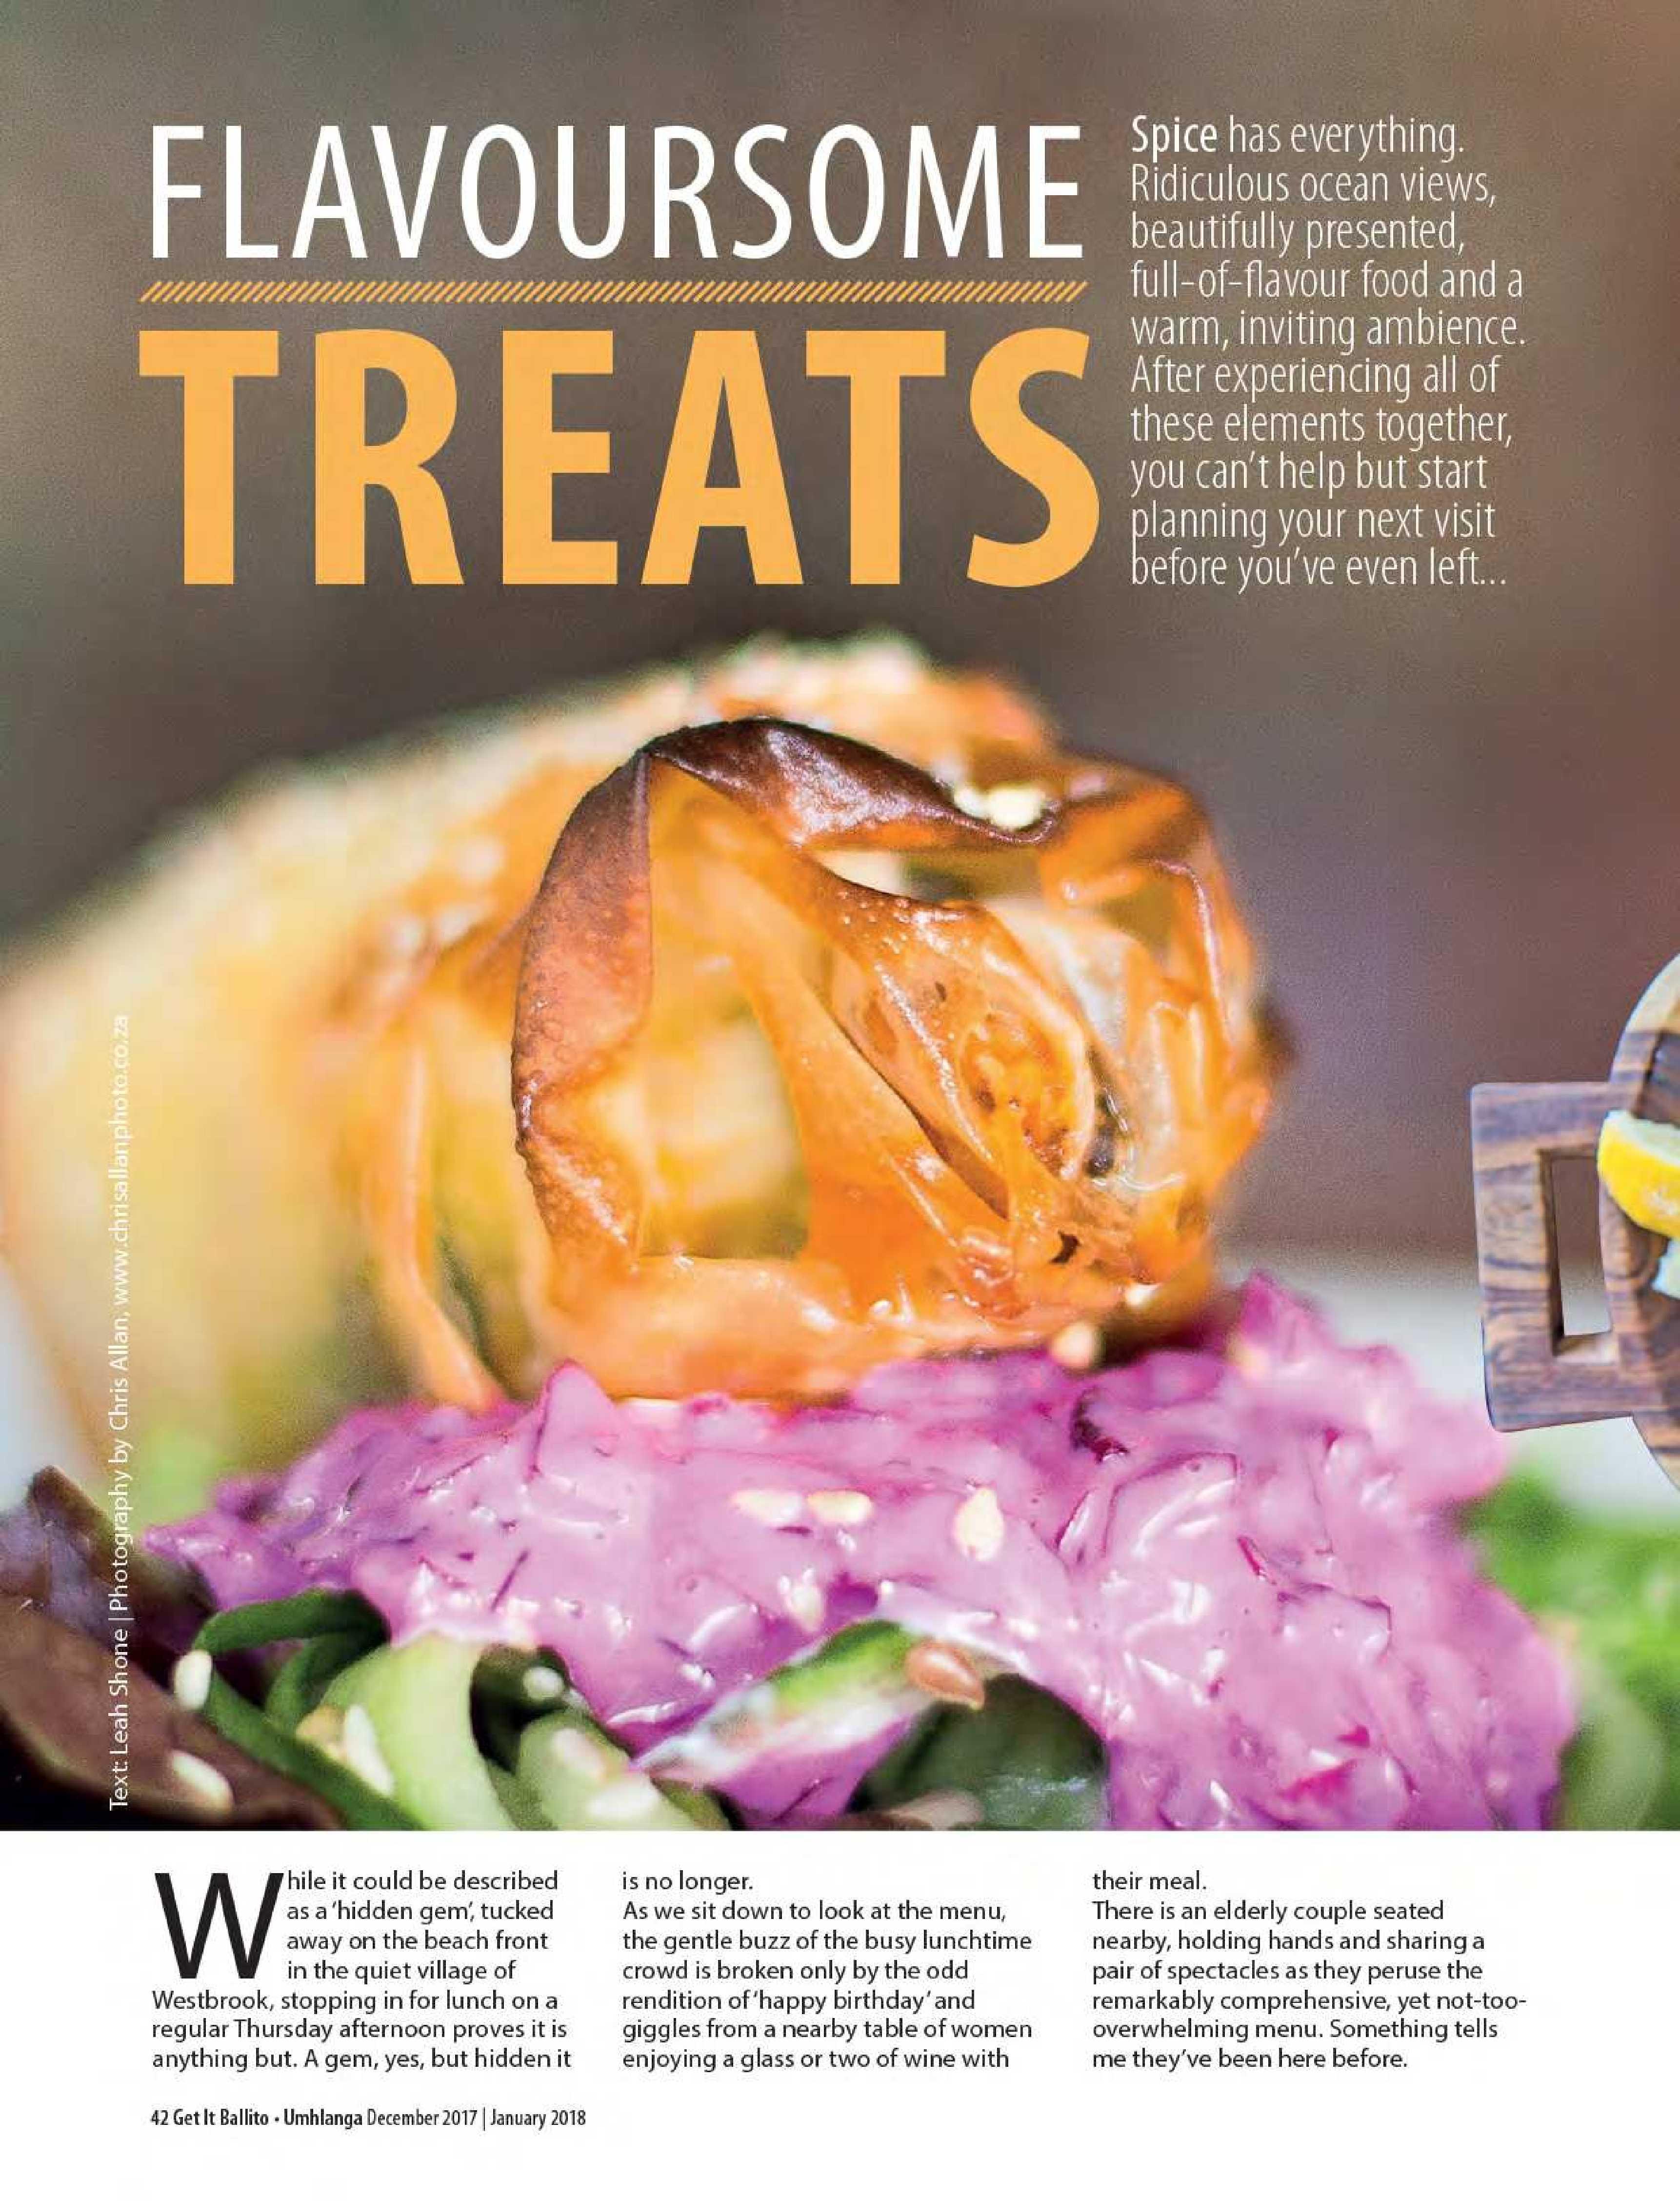 get-magazine-ballitoumhlanga-december-2017-january-2018-2-epapers-page-44